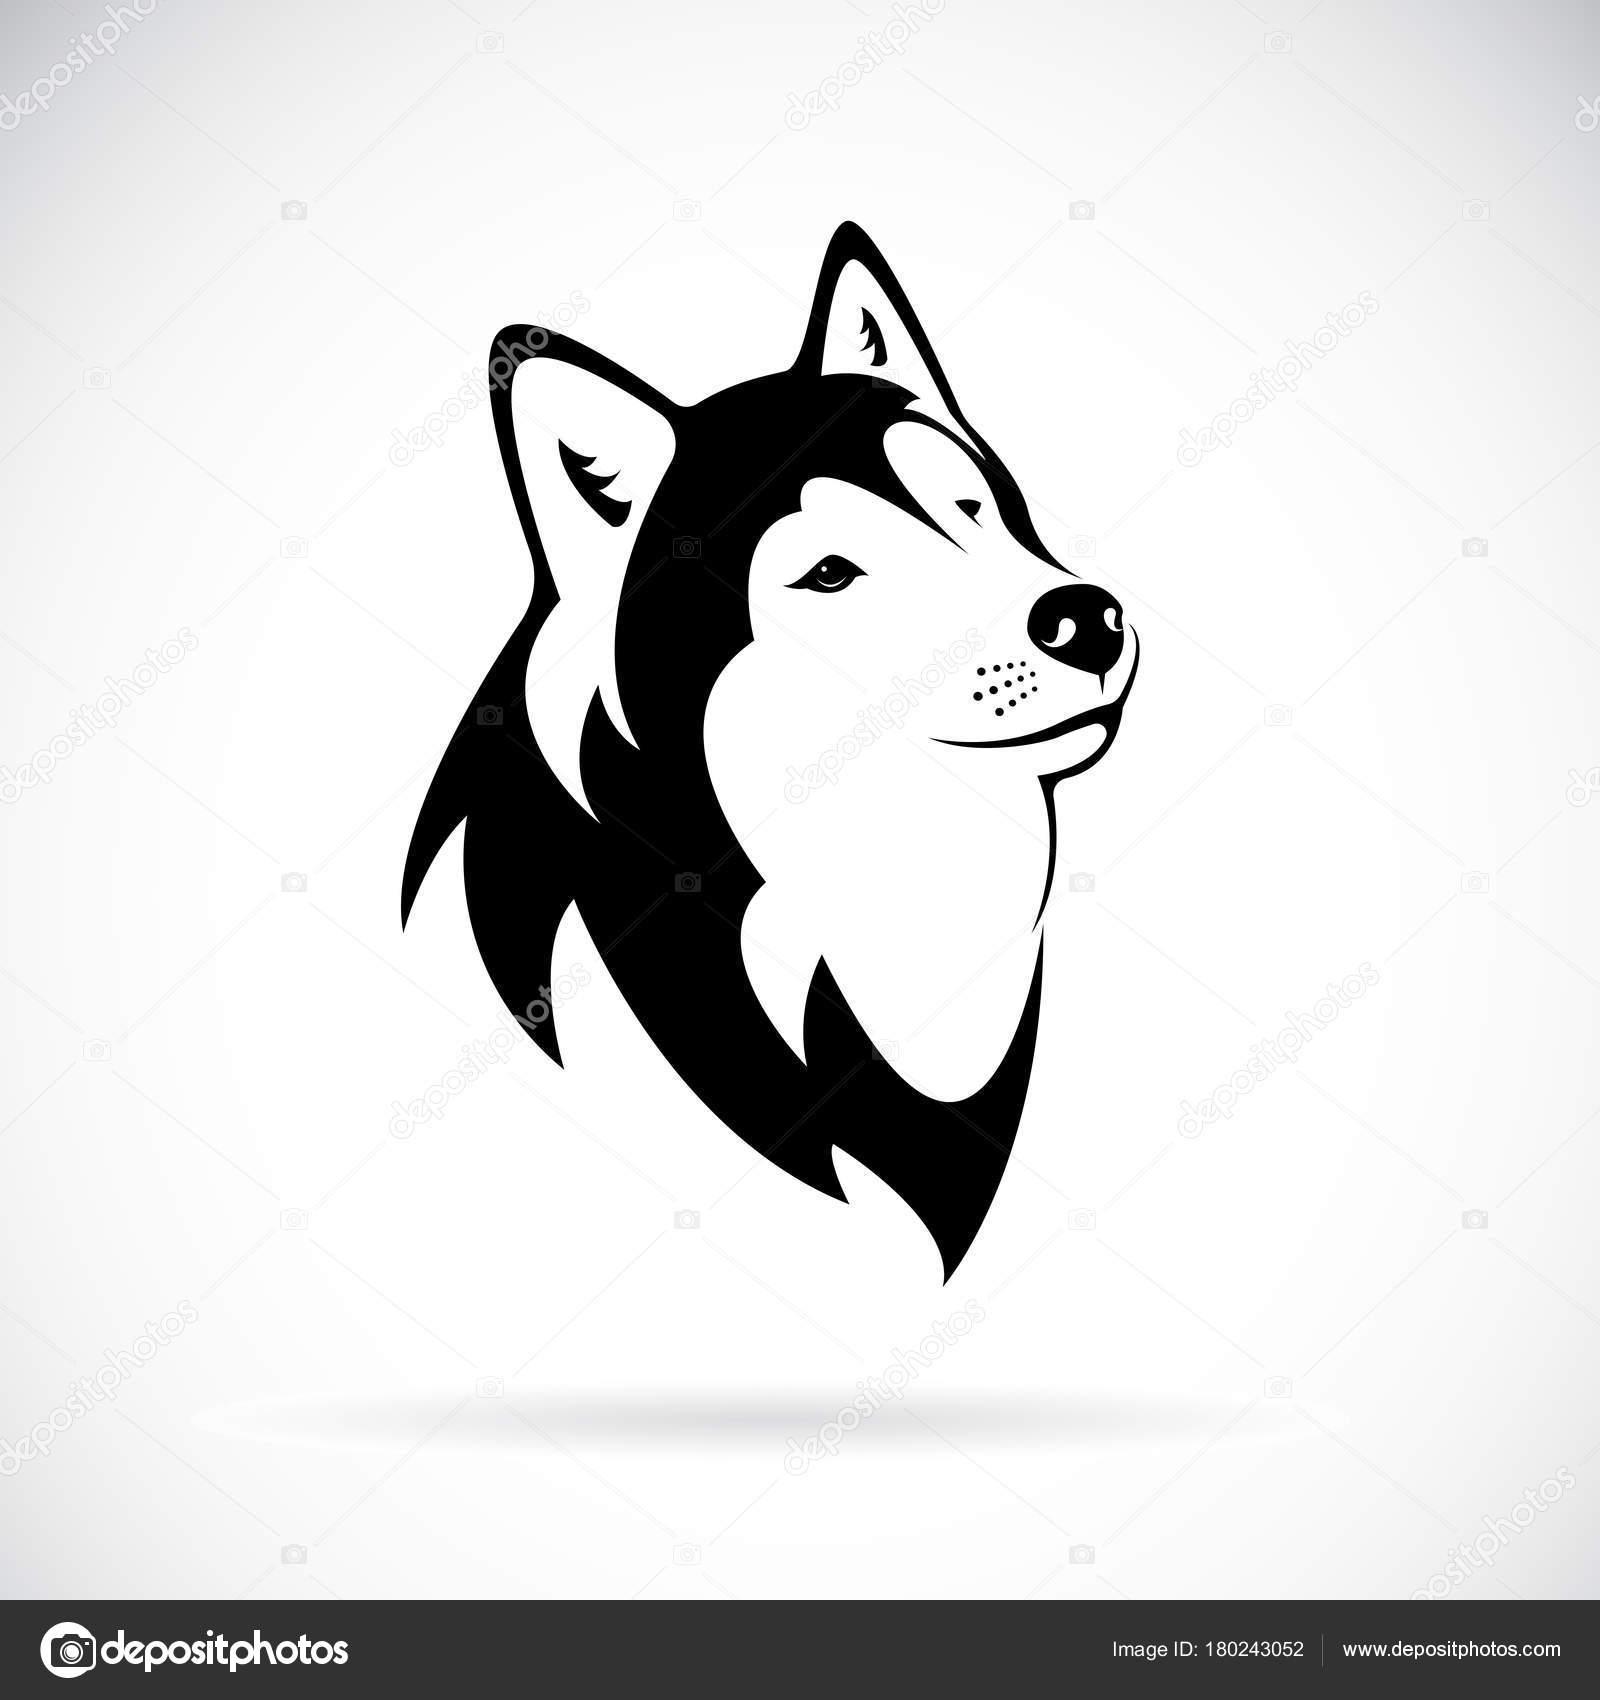 Dibujos La Etnia Negra Faciles Vector De Un Husky Siberiano De